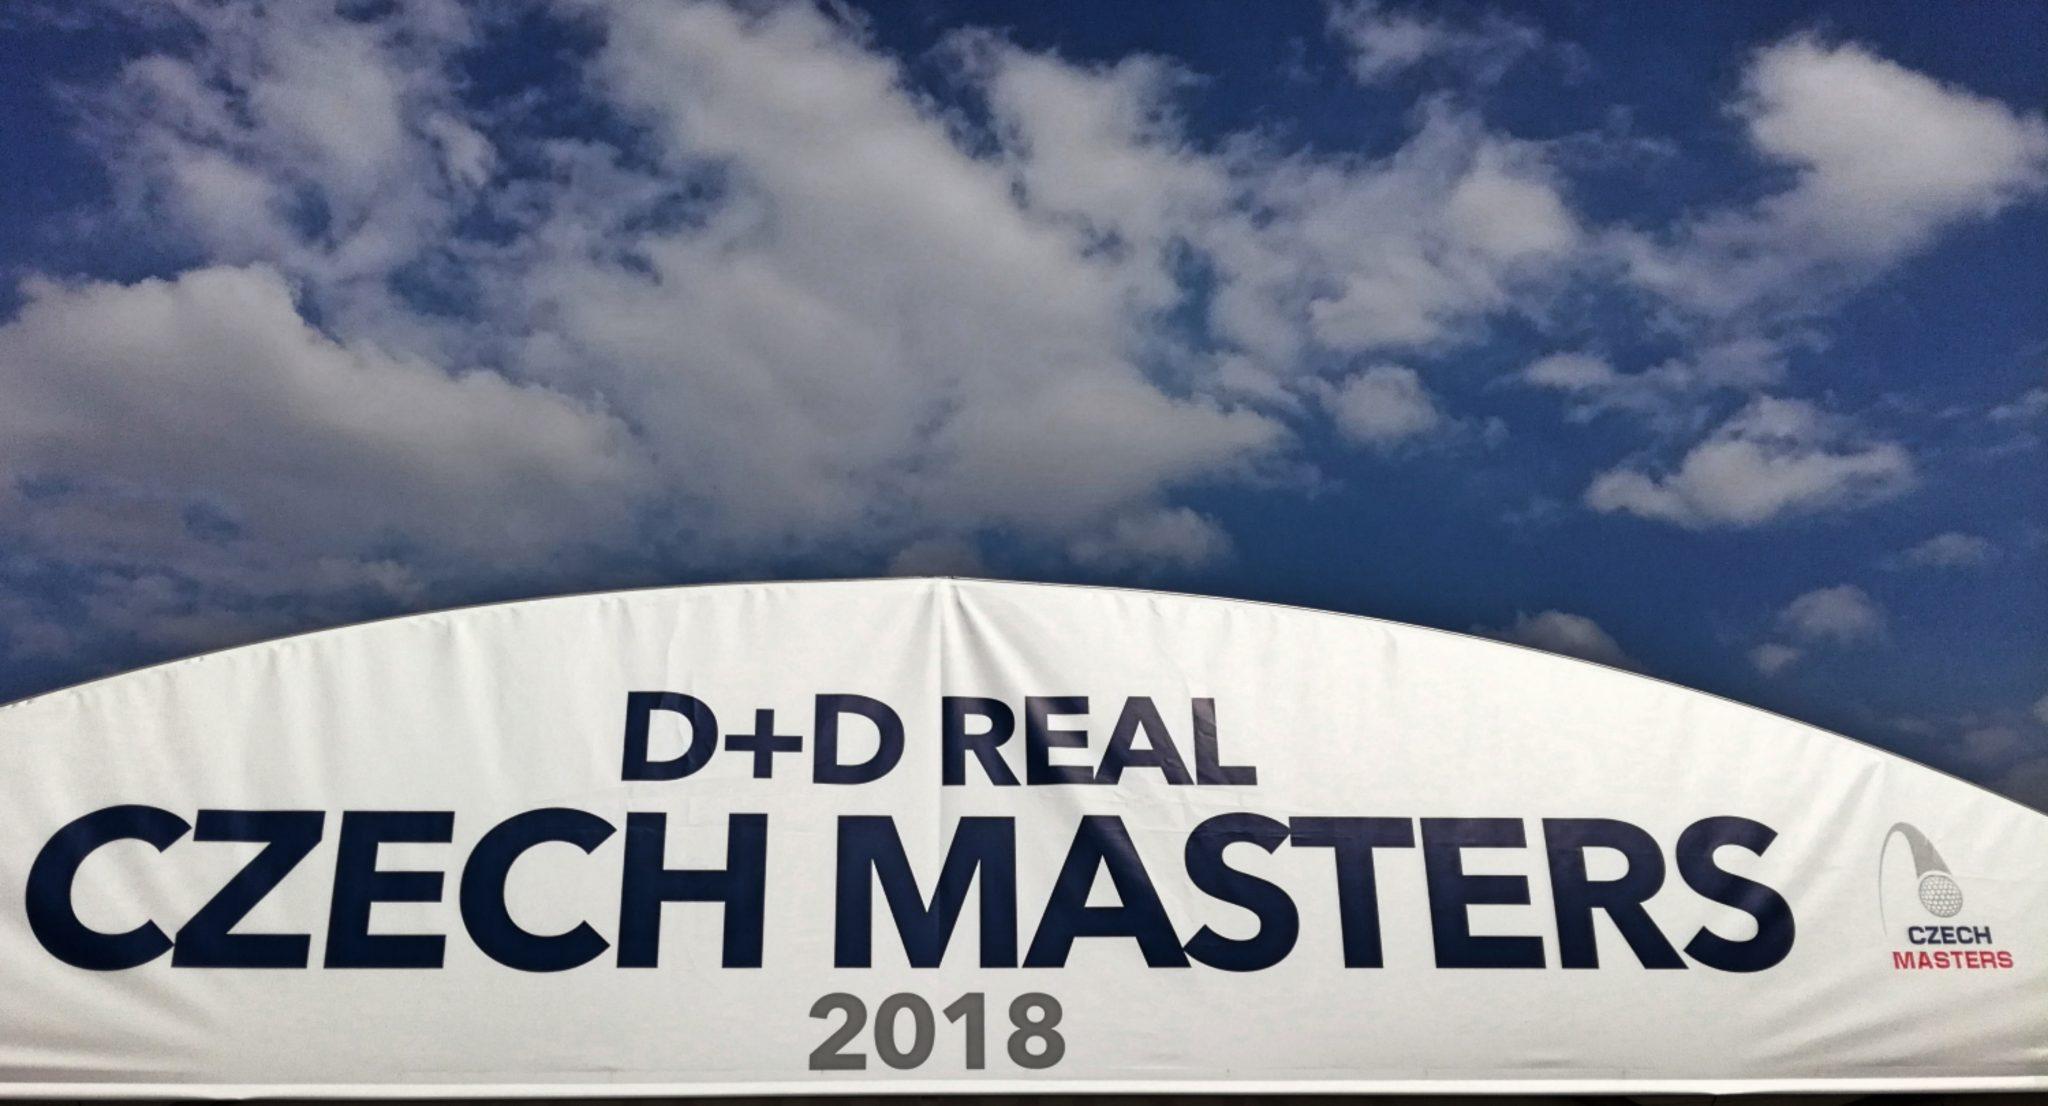 Стартови времена D+D Real Czech Masters – ден 1 и 2